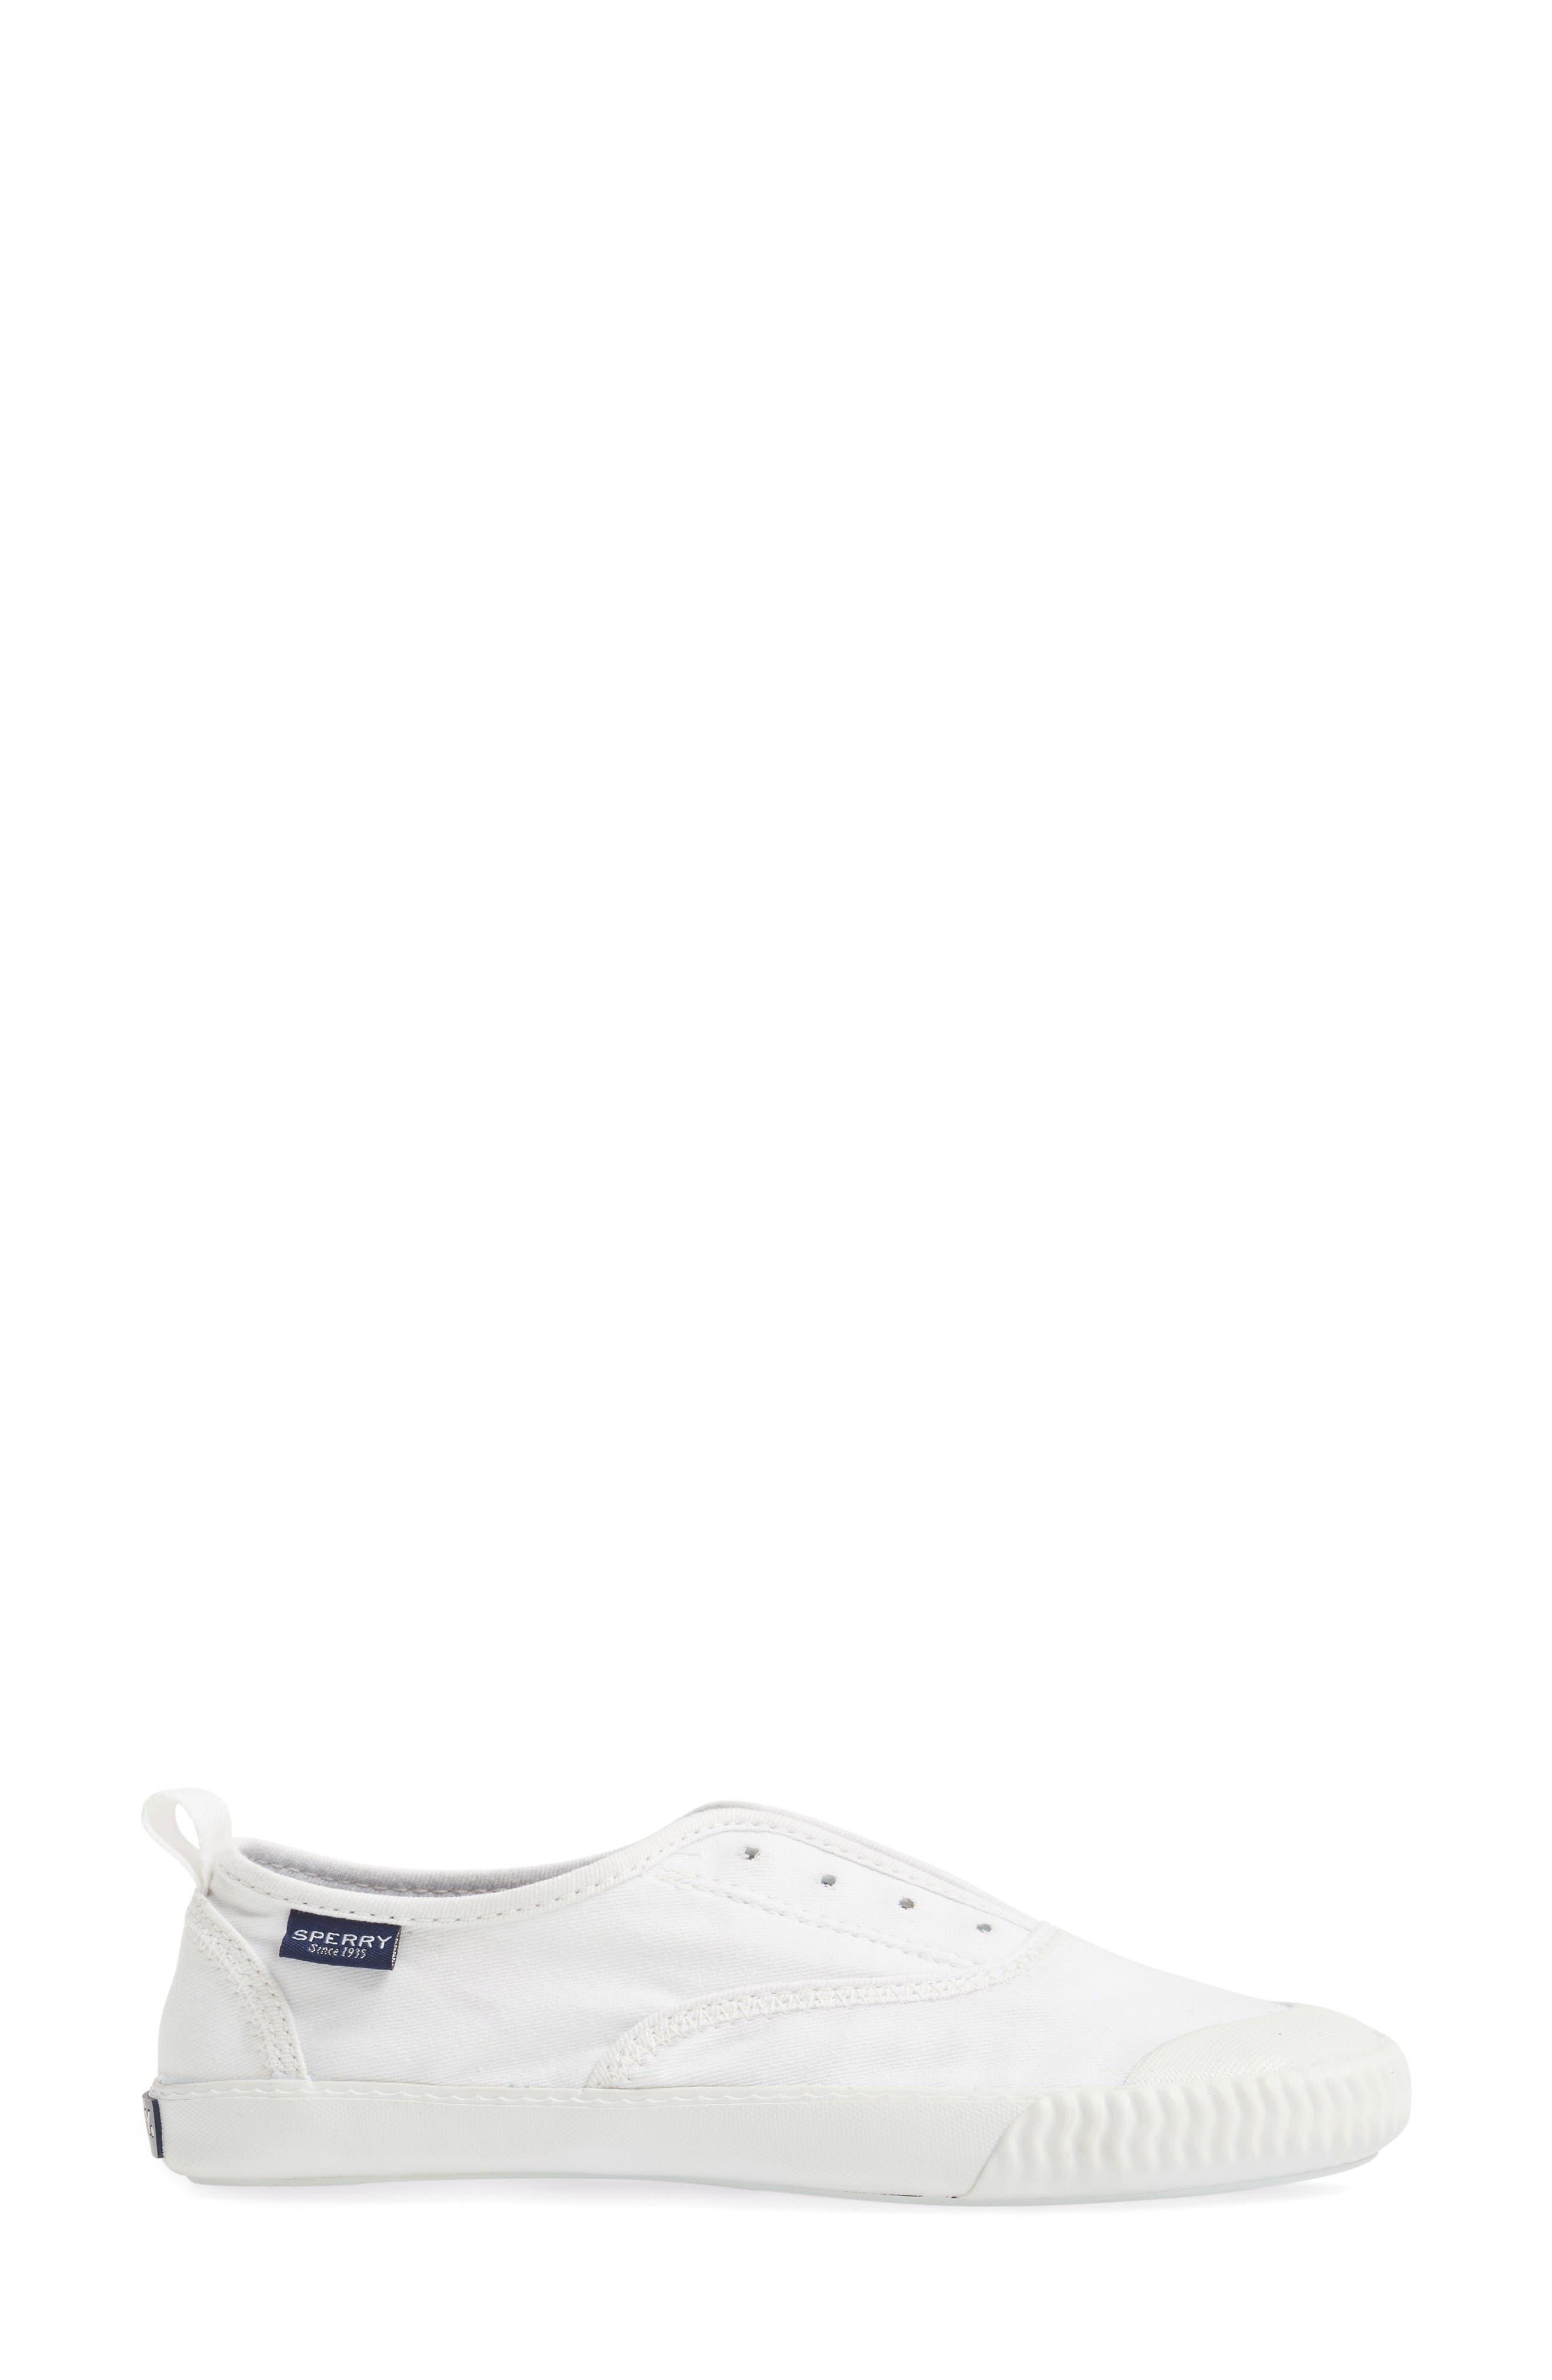 Sayel Slip-On Sneaker,                             Alternate thumbnail 3, color,                             White Fabric